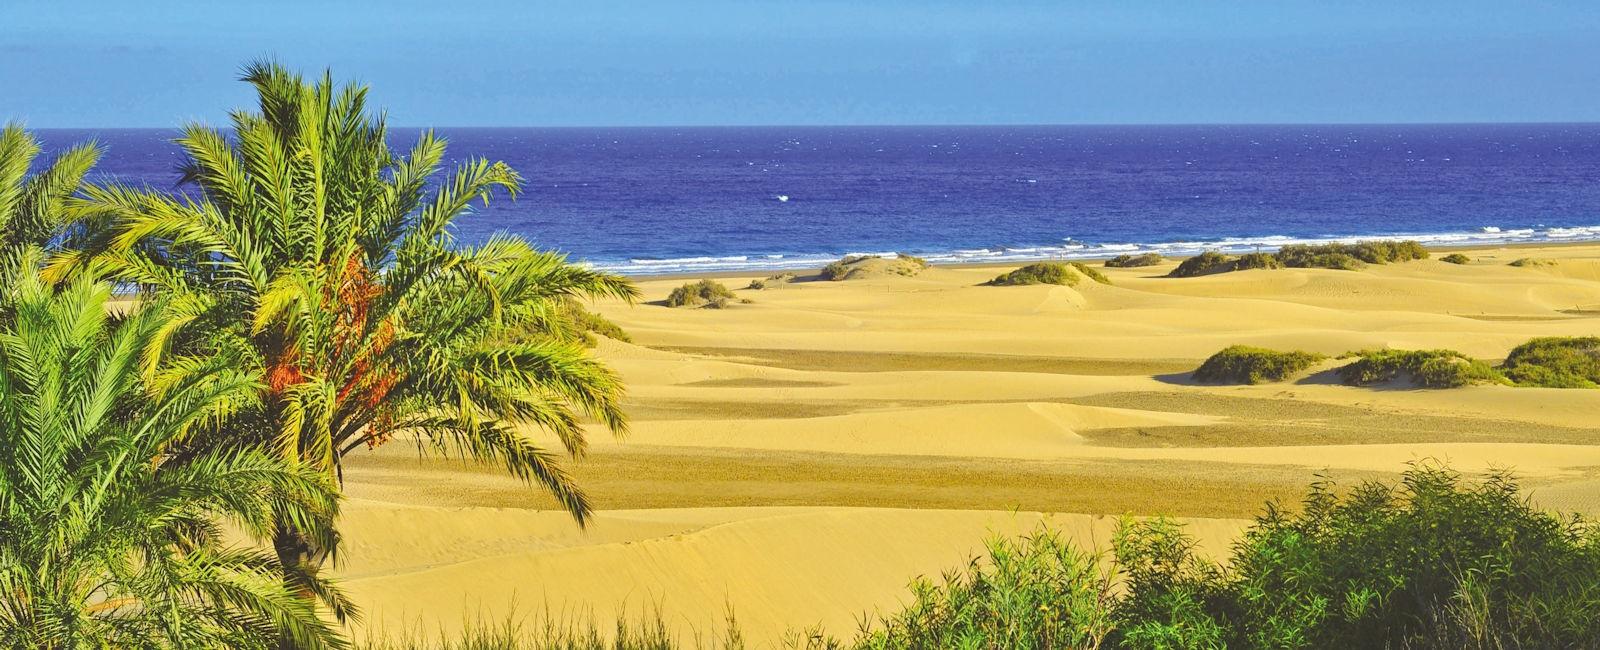 Luxury Gran Canaria Holidays